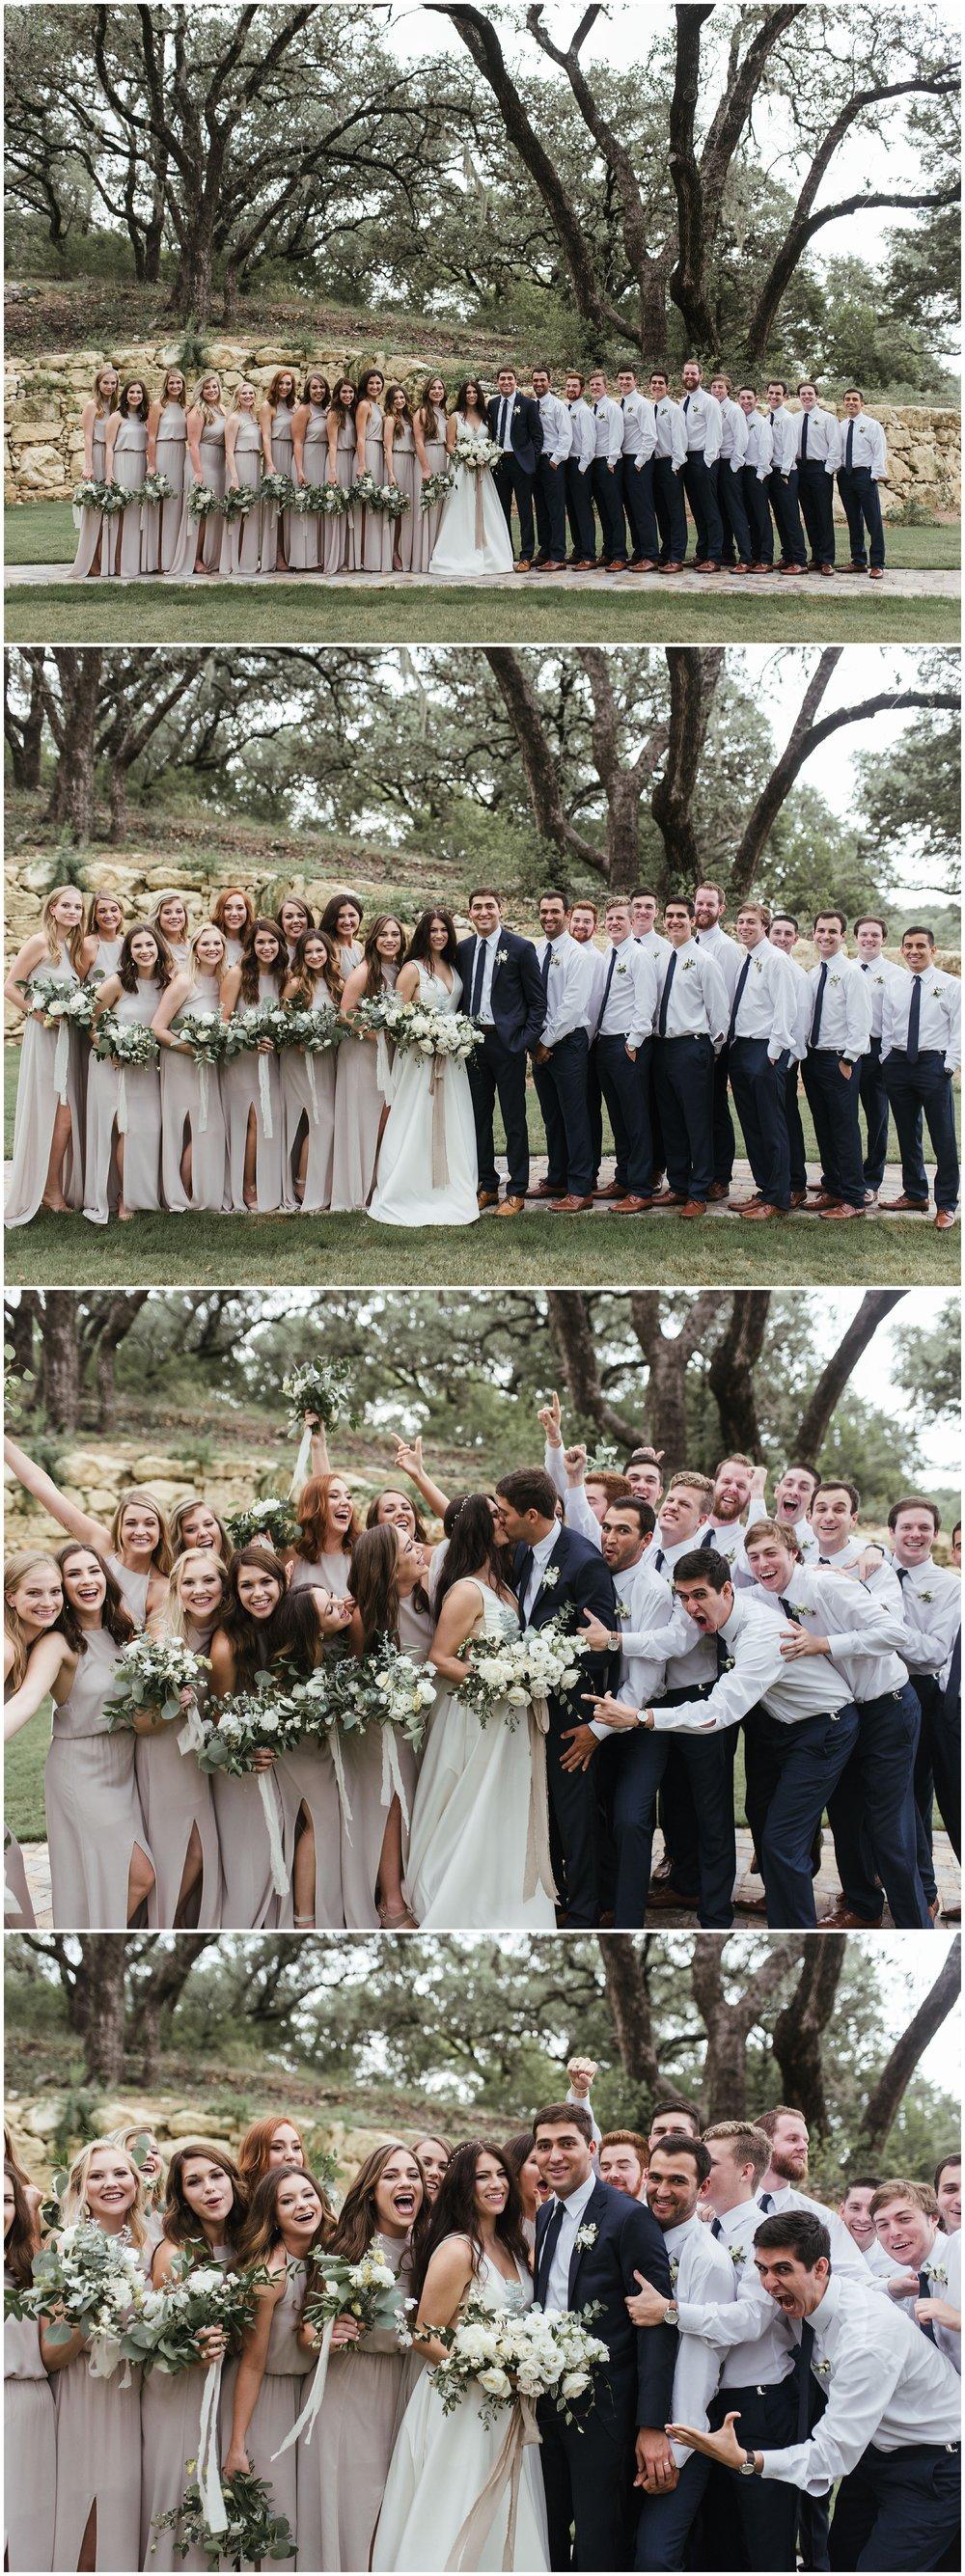 Hidden Falls Wedding | Kennedi+Marshall | Fort Worth Wedding Photographer | www.jordanmitchellphotography.com